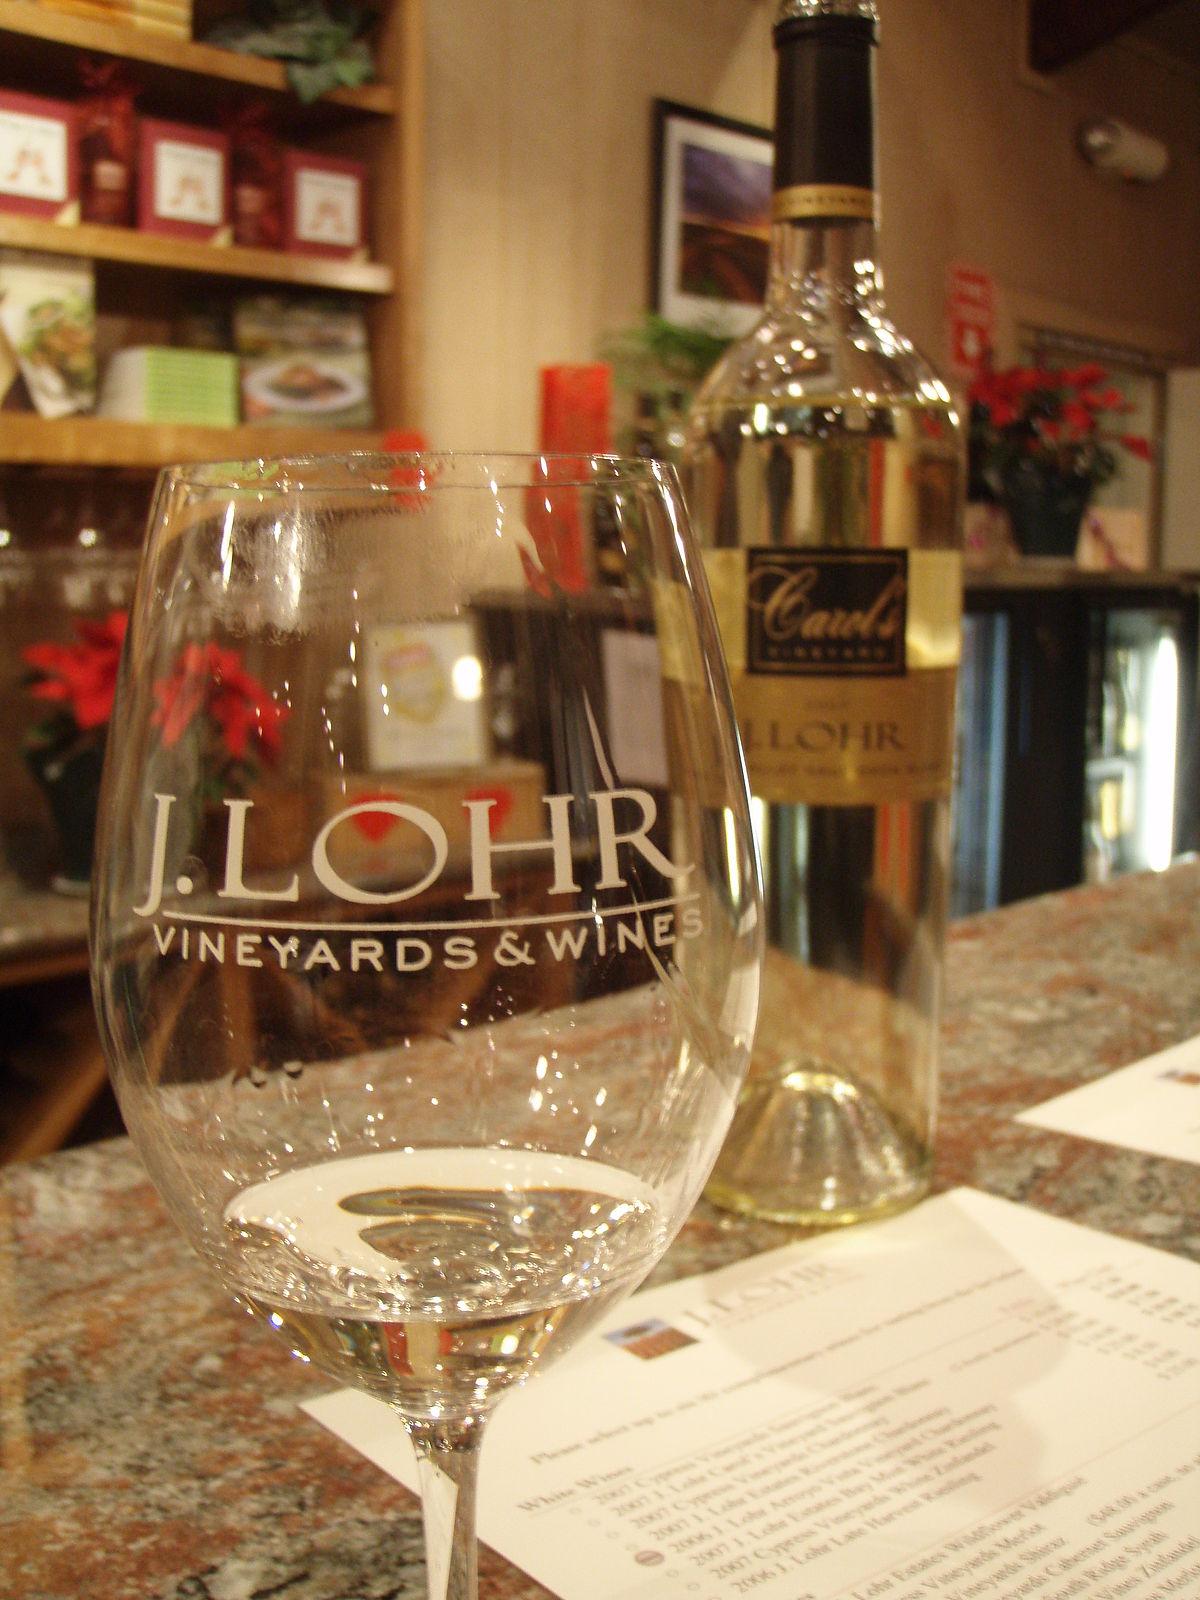 J Lohr Vineyards and Wines  Wikipedia